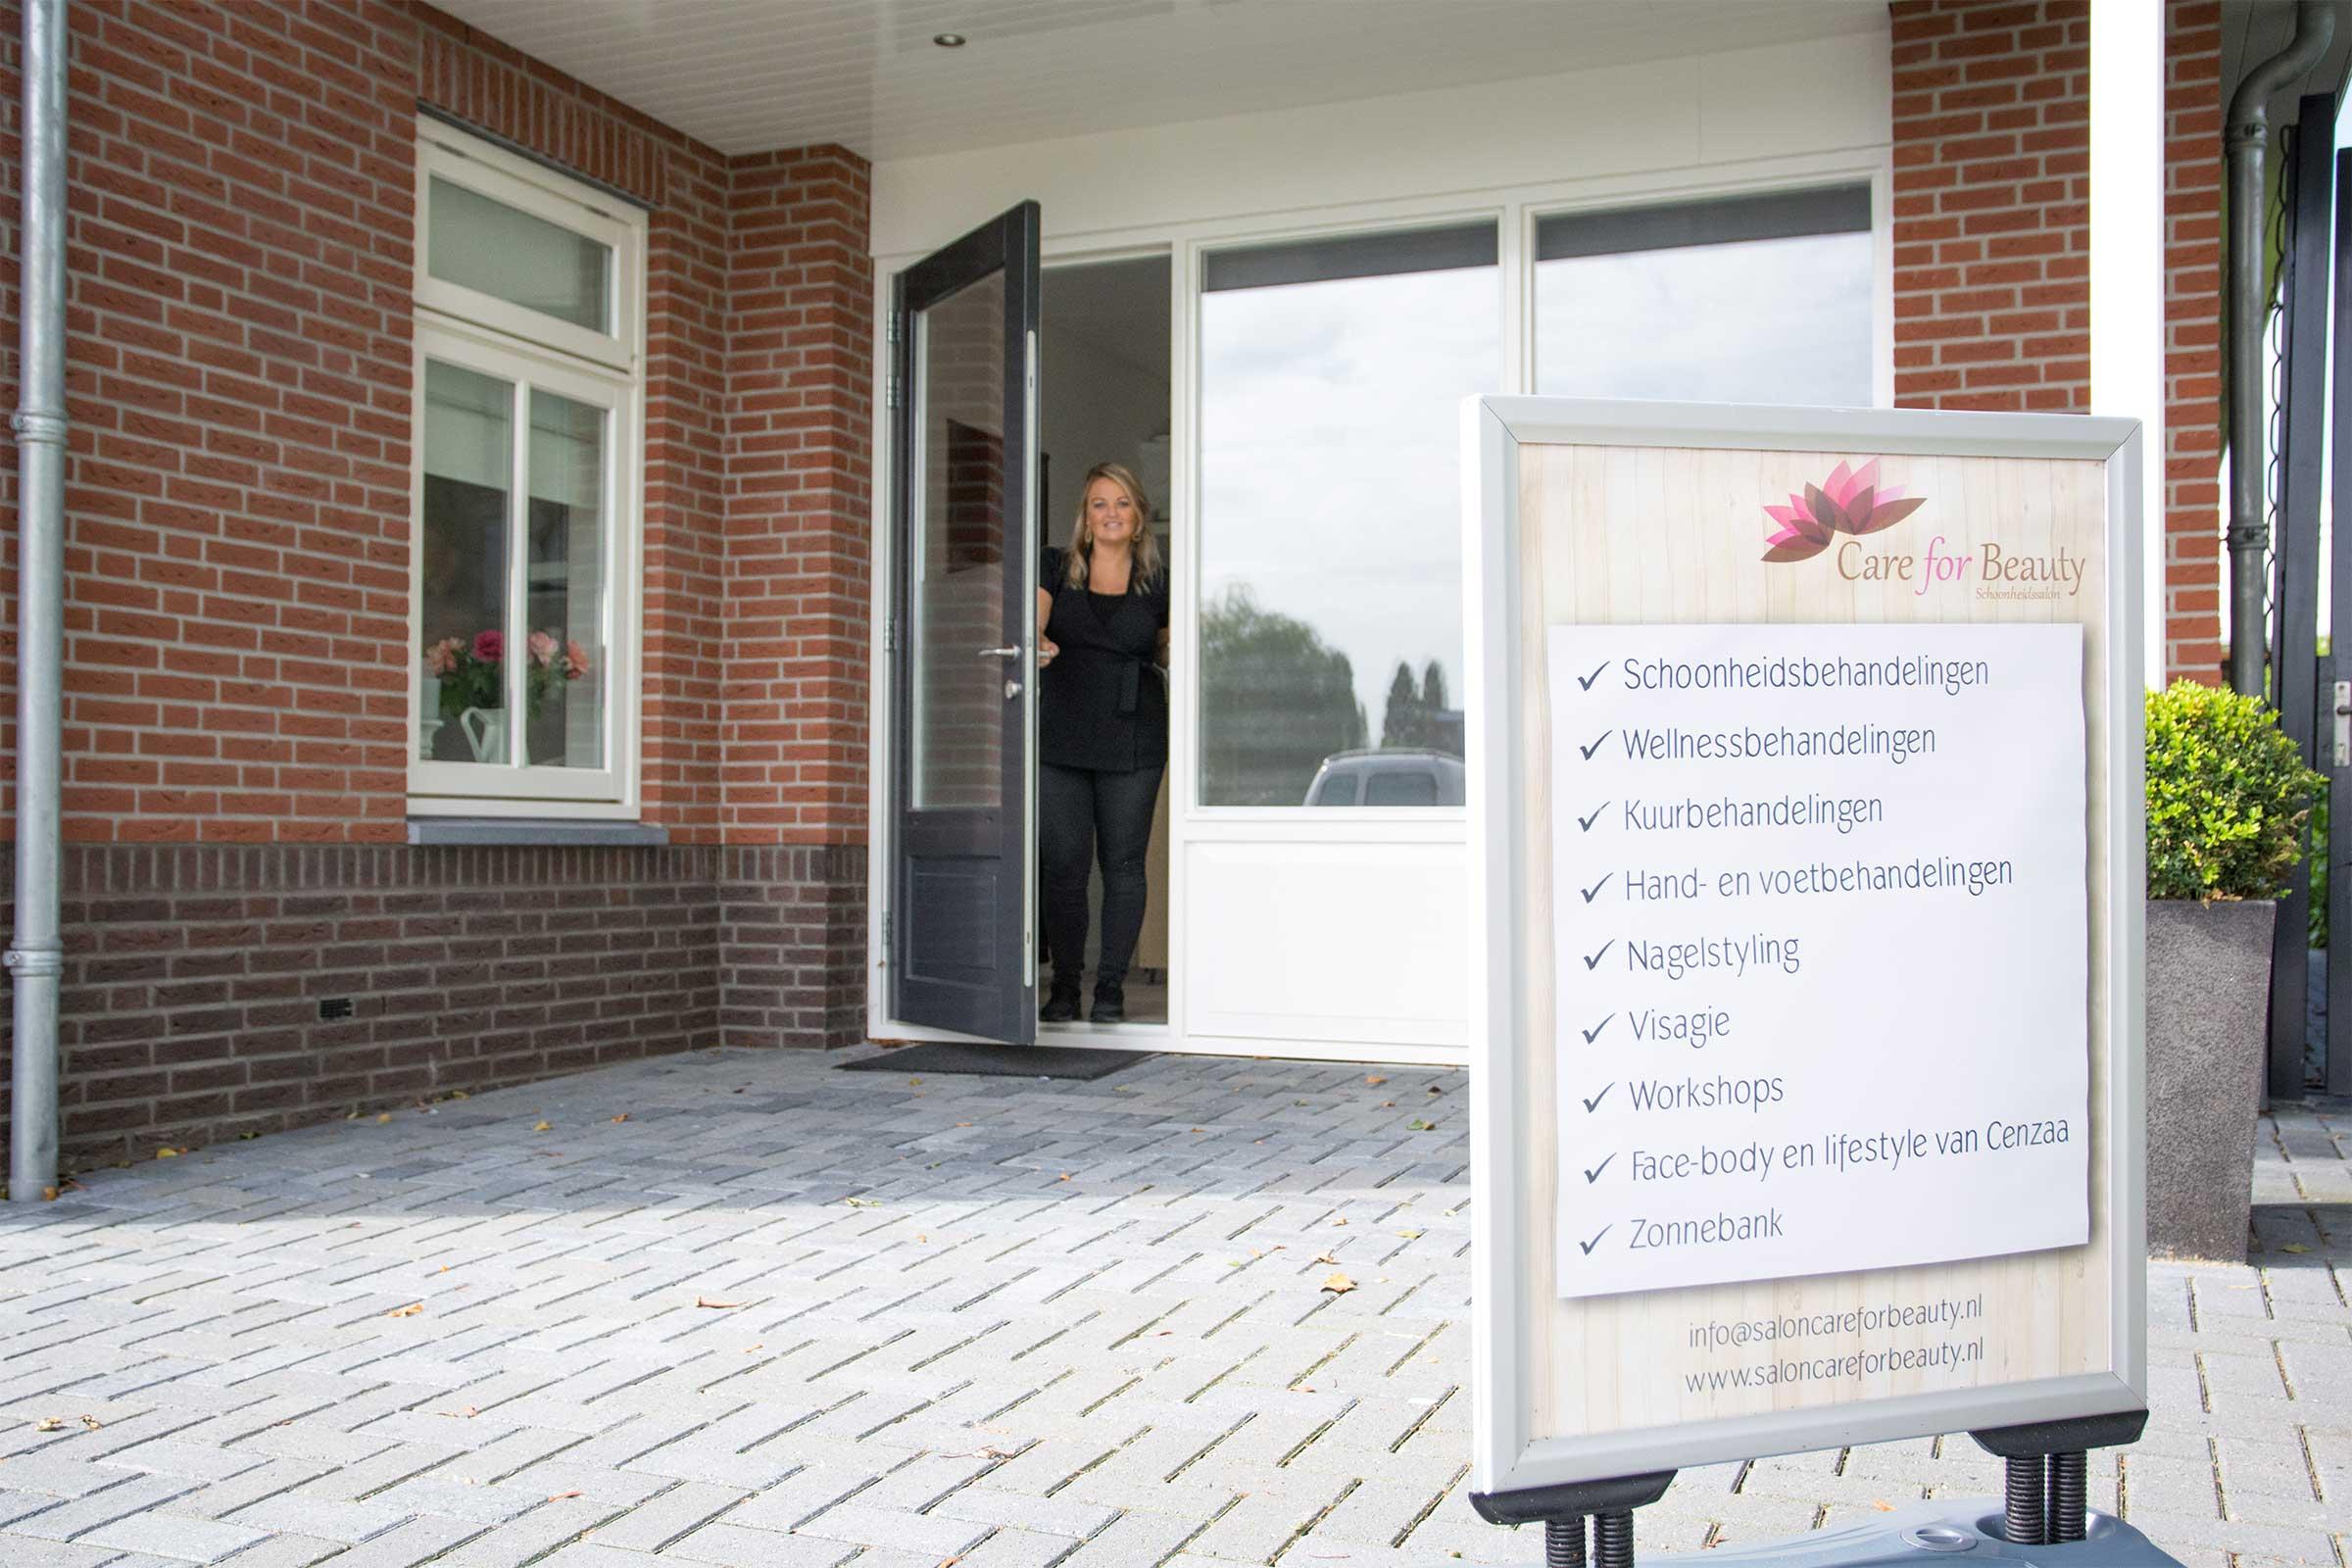 Schoonheidssalon Hardinxveld-Giessendam